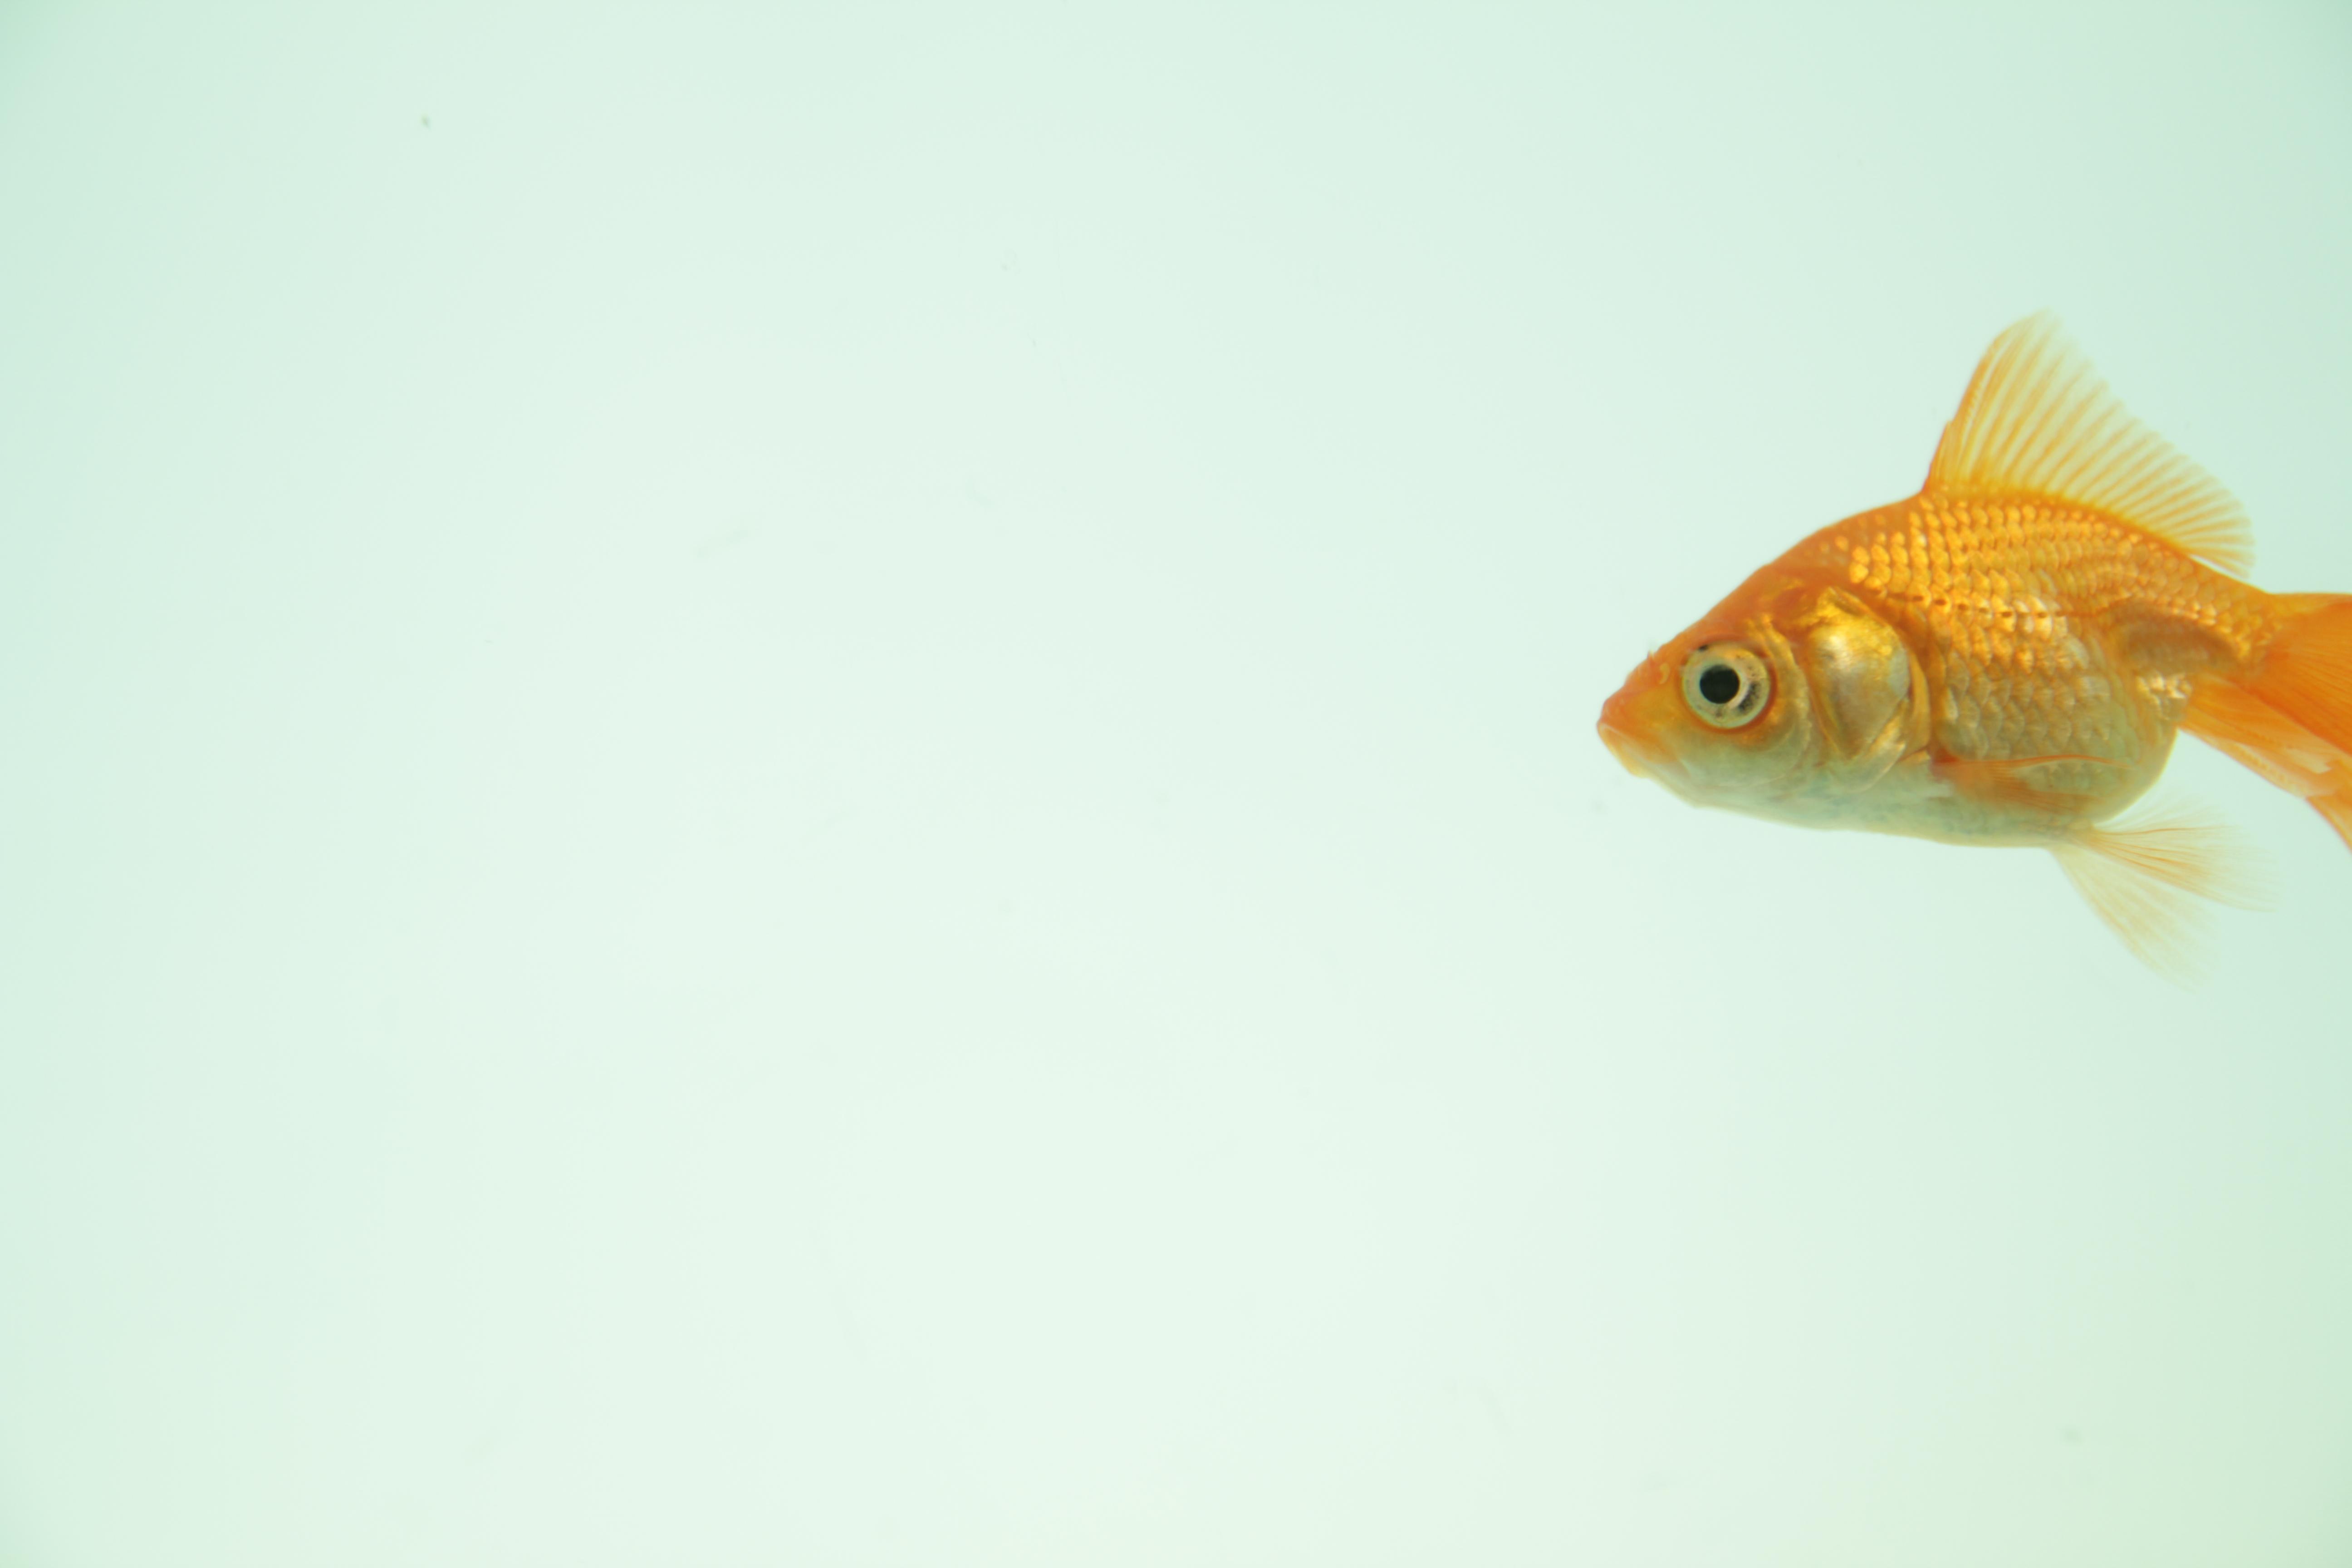 goldfish_1277223_90673634